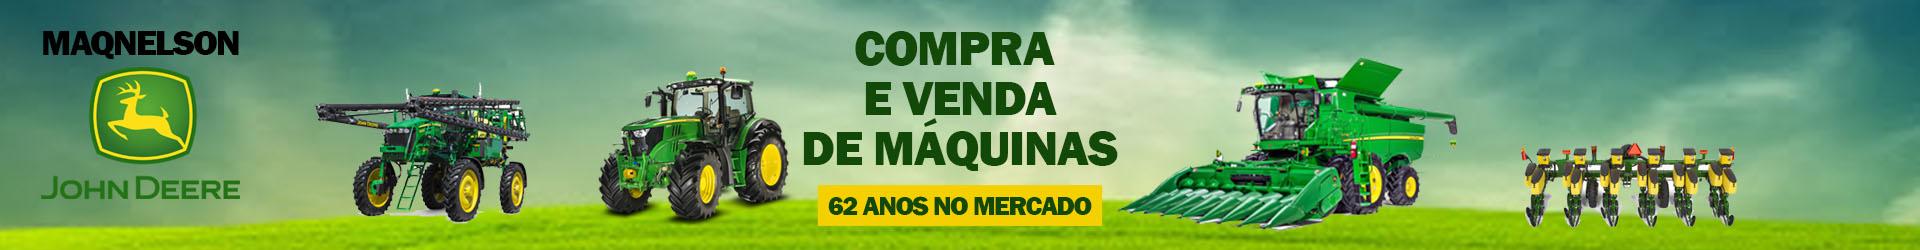 Maqnelson Agrícola - John Deere Matriz